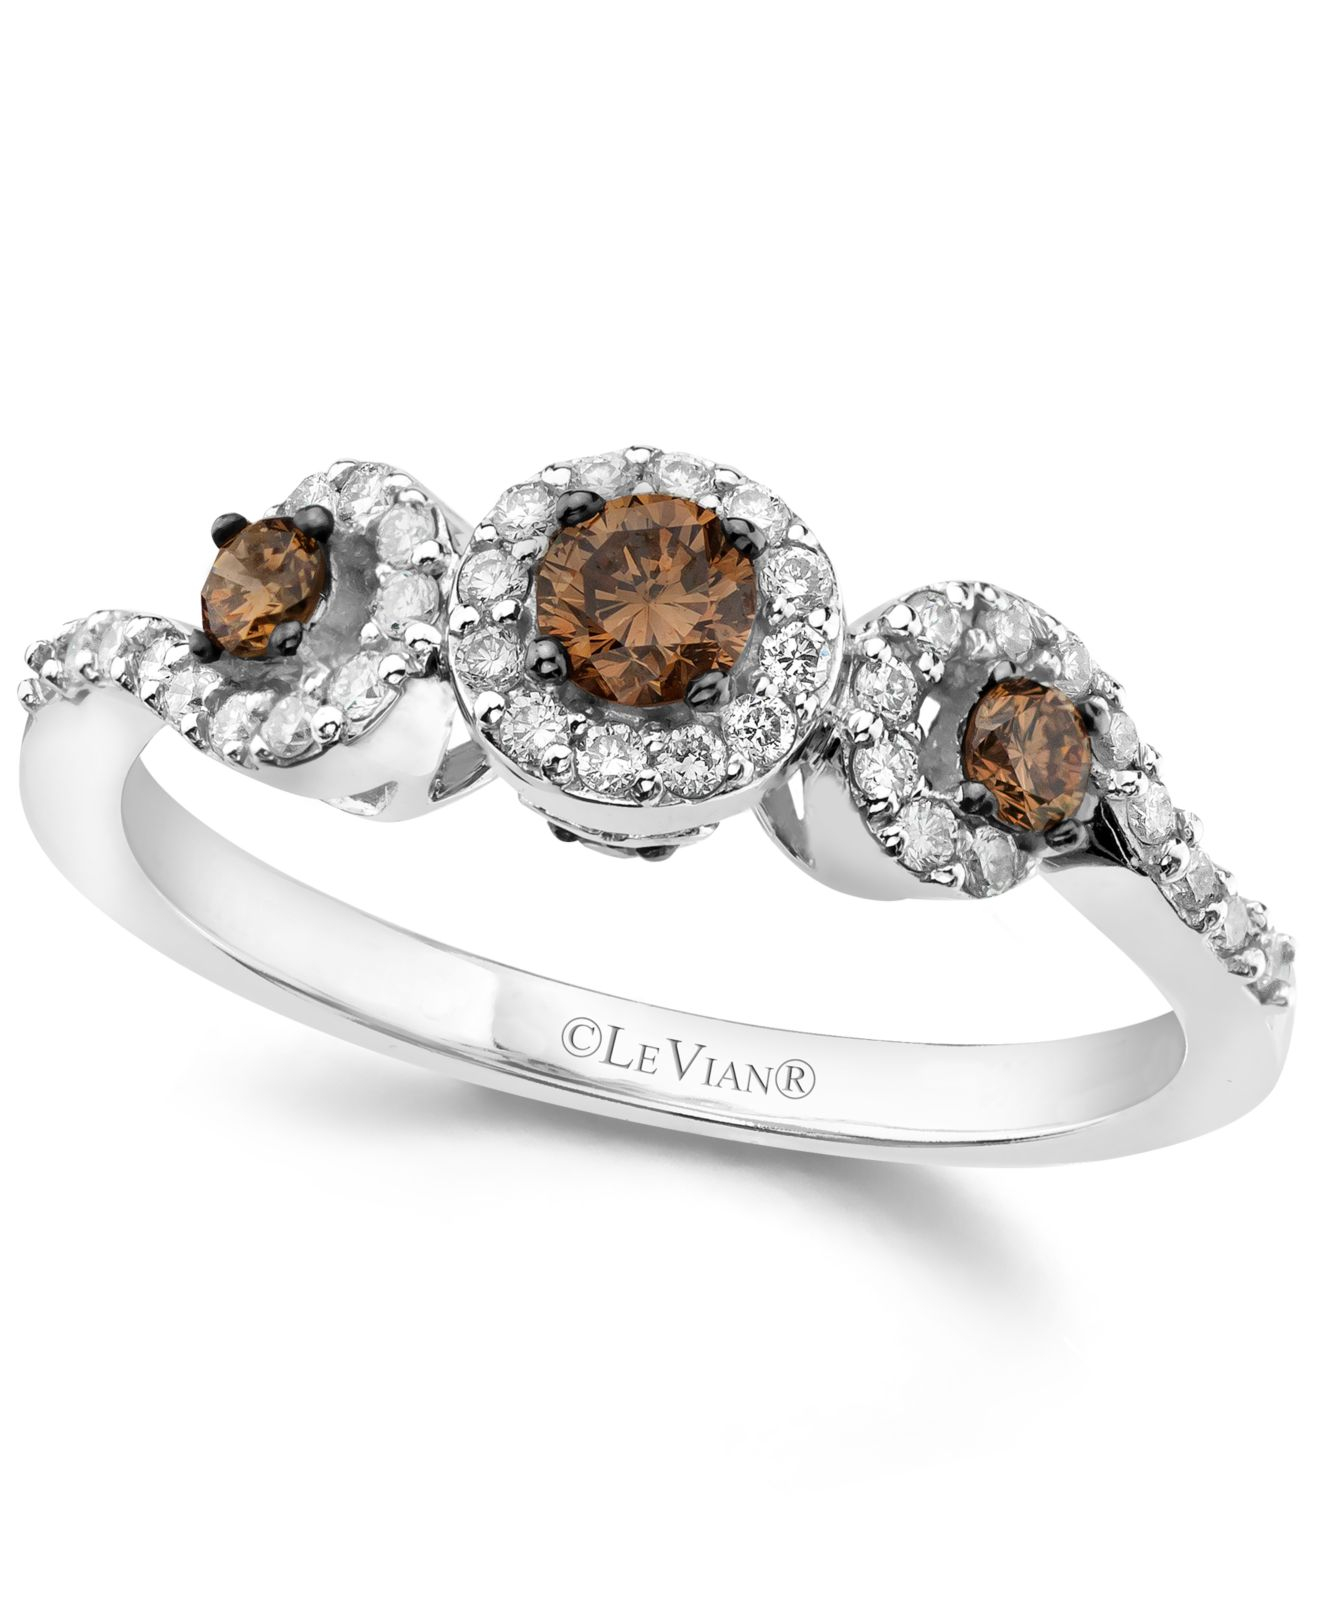 Chocolate Diamond Engagement Ring Set Gallery - Fashion Jewelry Ideas